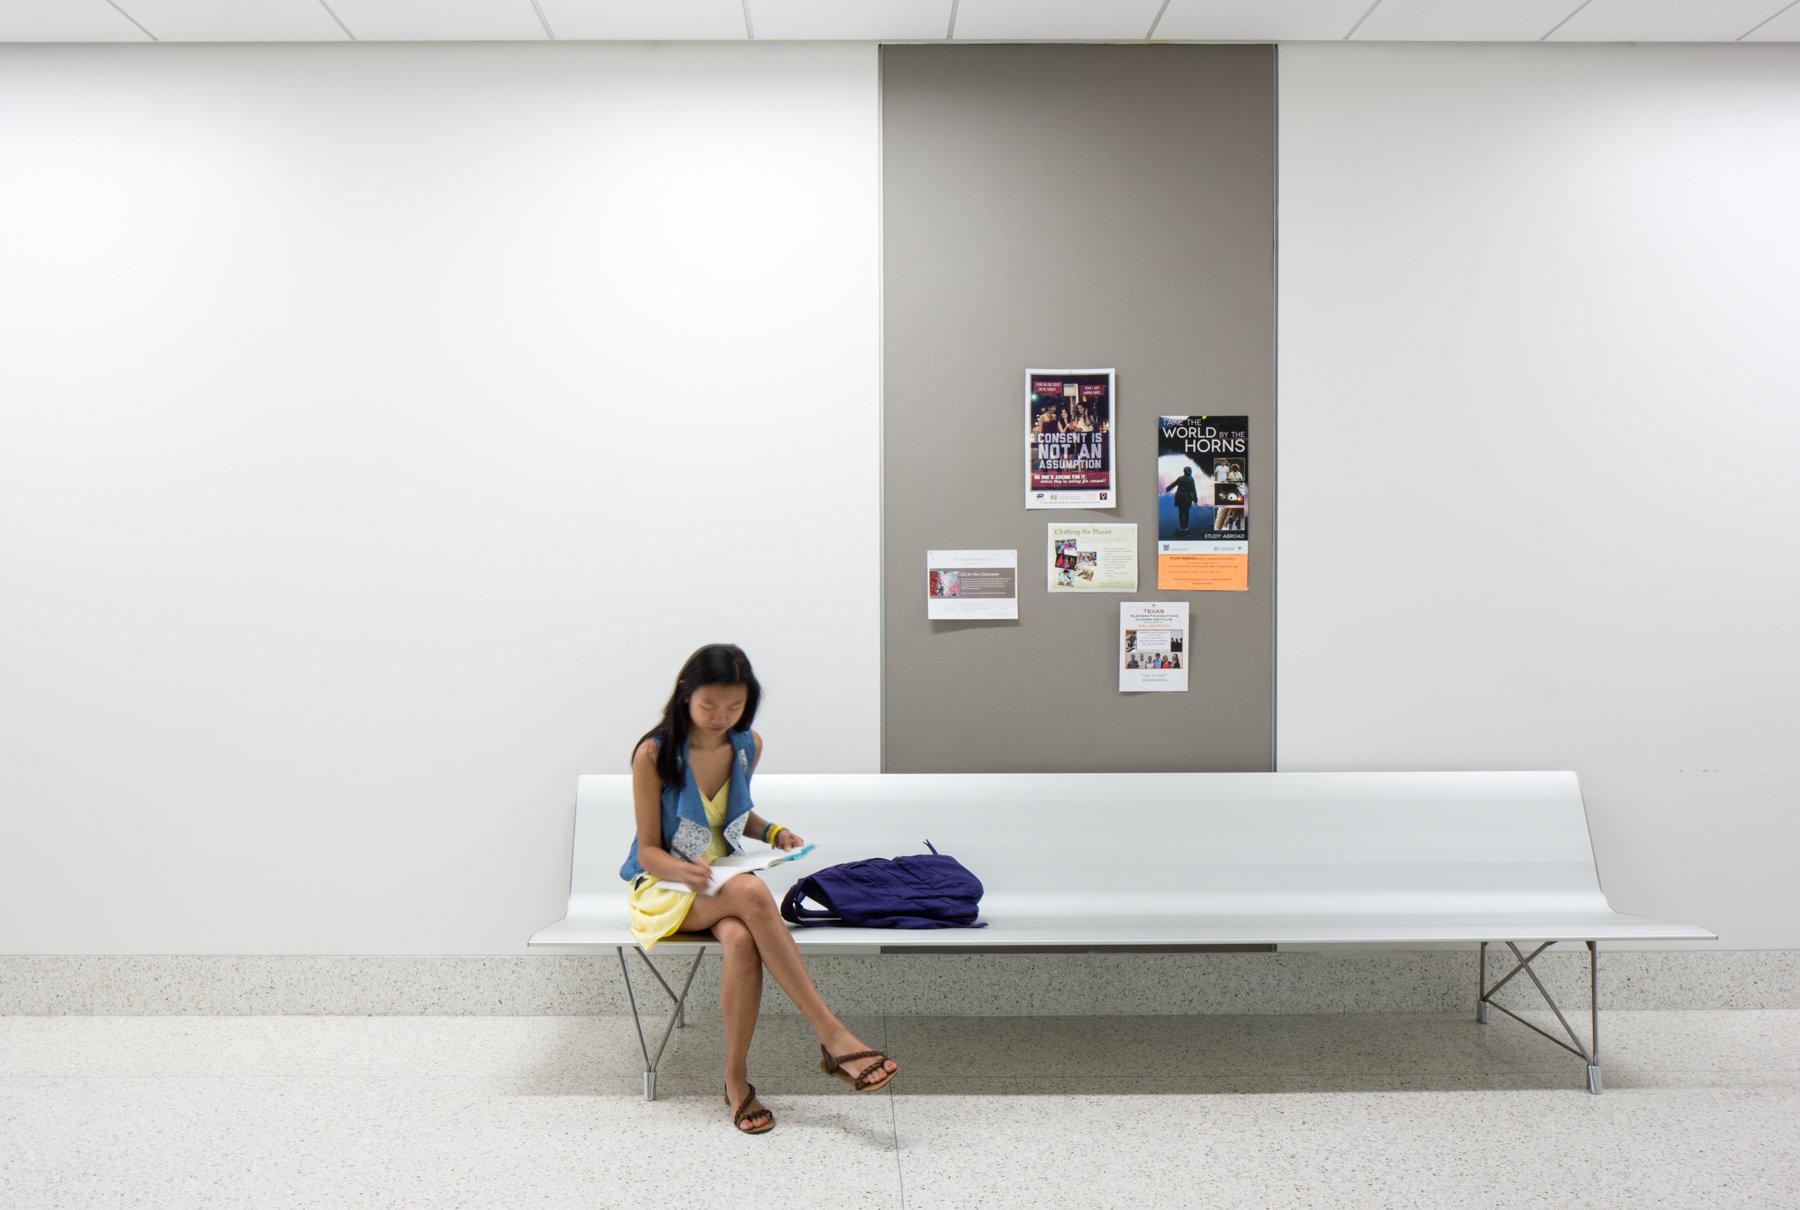 hallwaybenchgirl.jpg